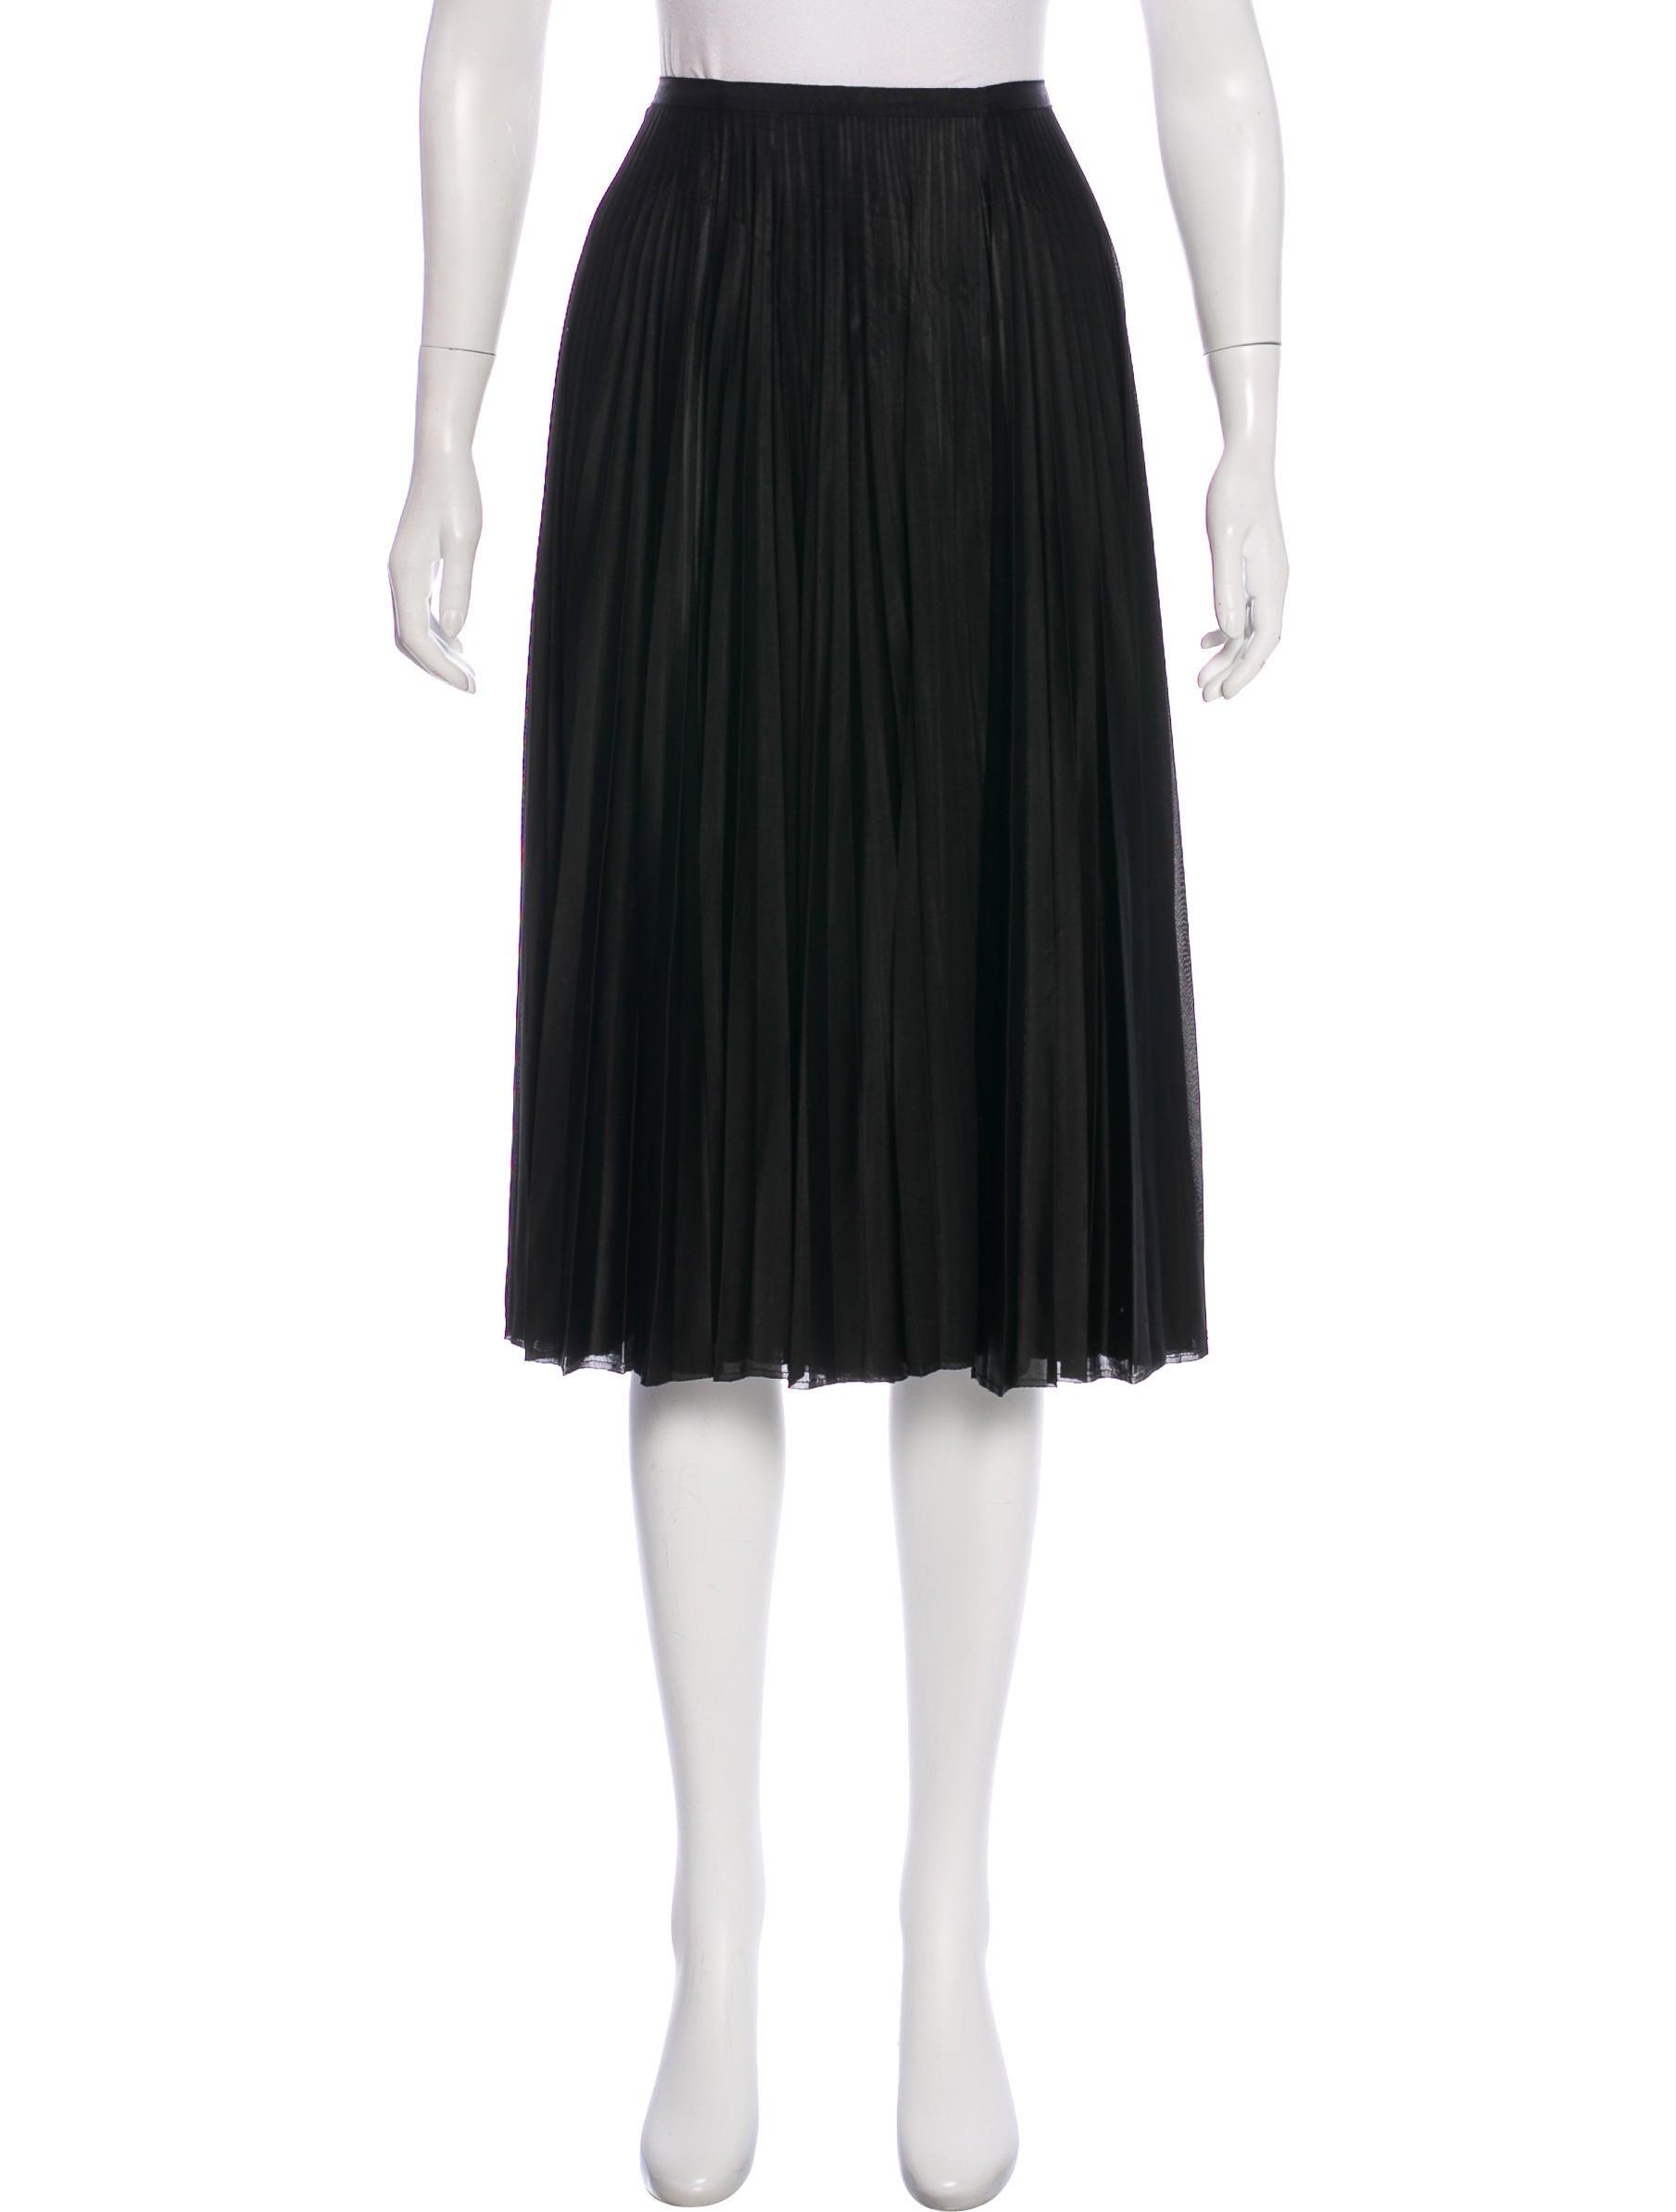 e1549d6c77 TSE Cashmere Pleated Midi Skirt - Clothing - TSCHG21061 | The RealReal